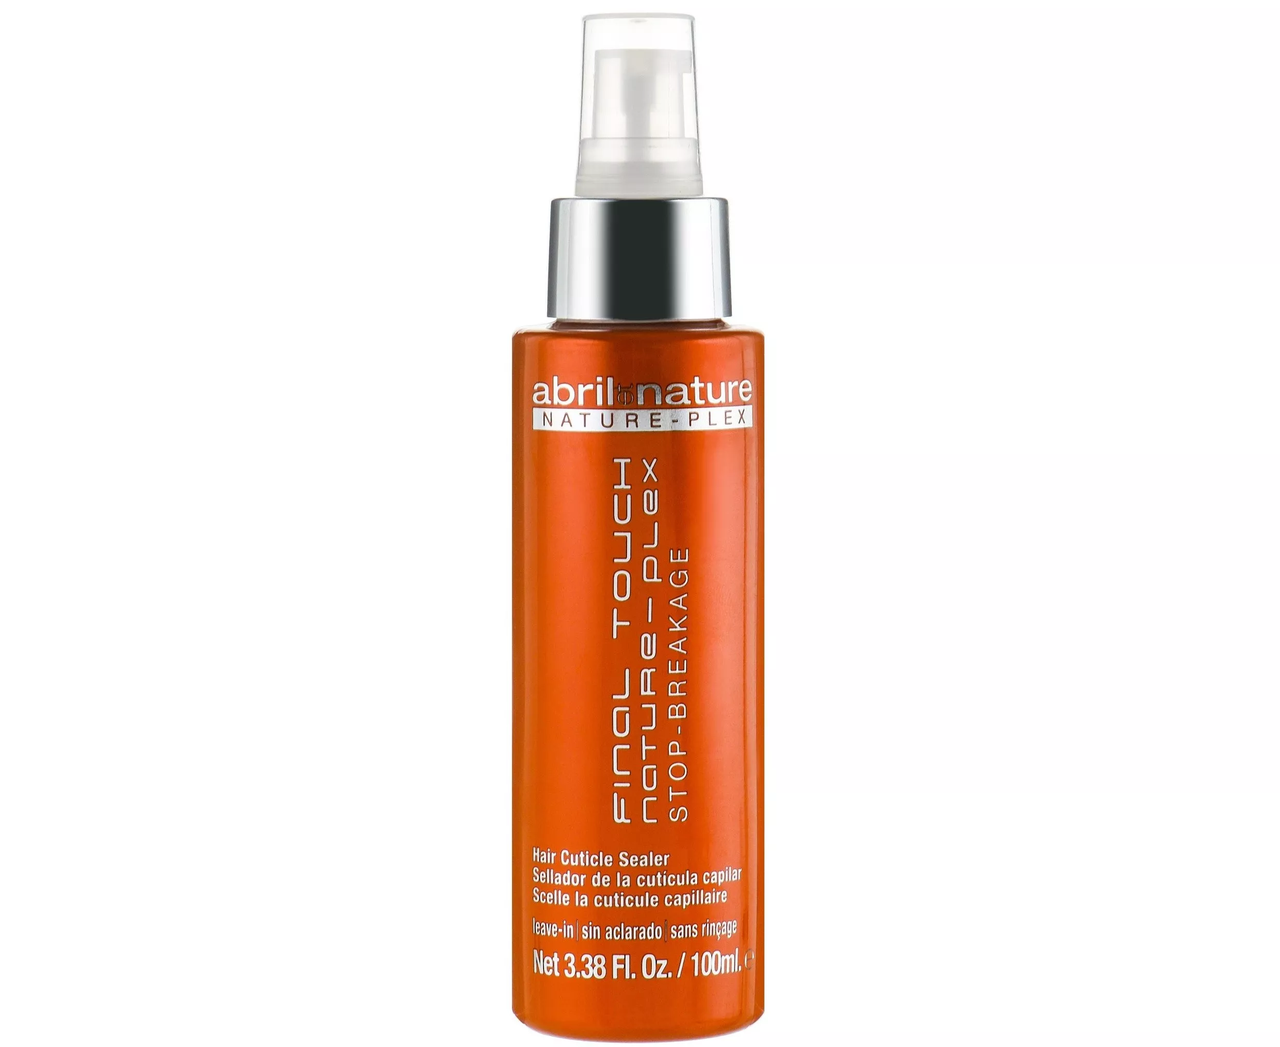 Сыворотка для восстановления и защиты волос Abril Et Nature Nature-Plex Final Touch Stop-Breakage Serum 100 мл